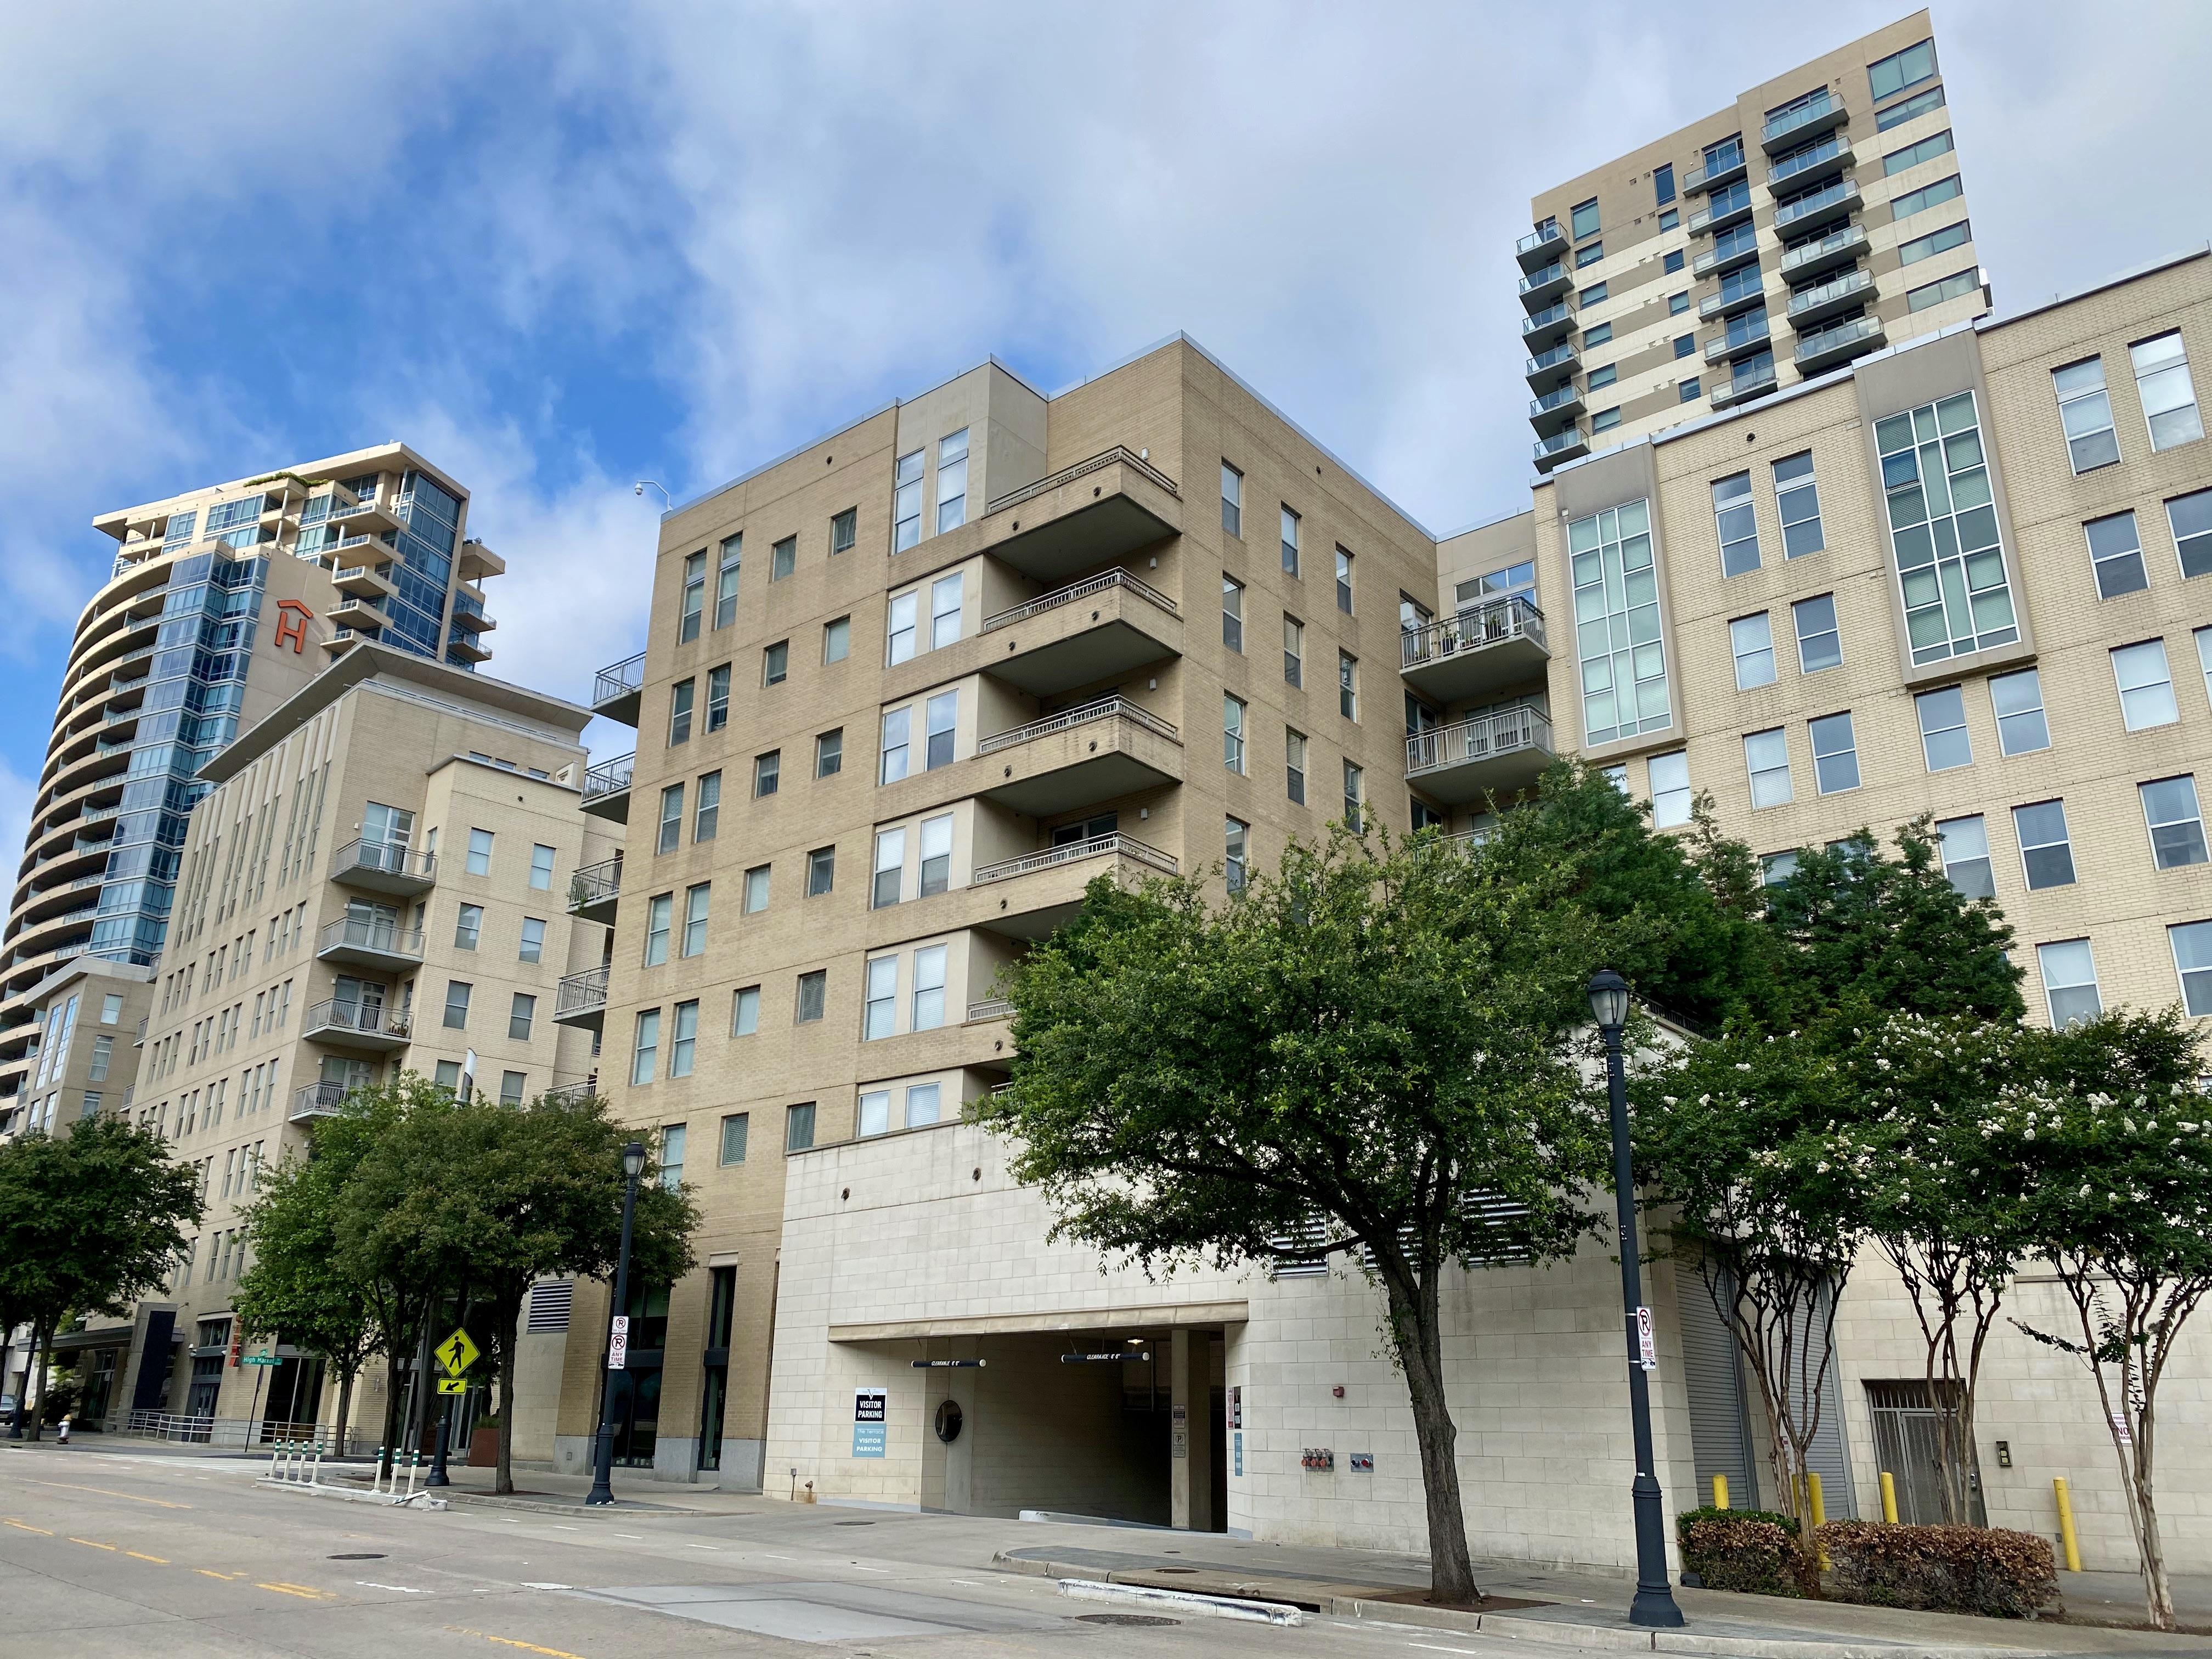 Victory Park Apartments off N Houston St, Dallas, TX